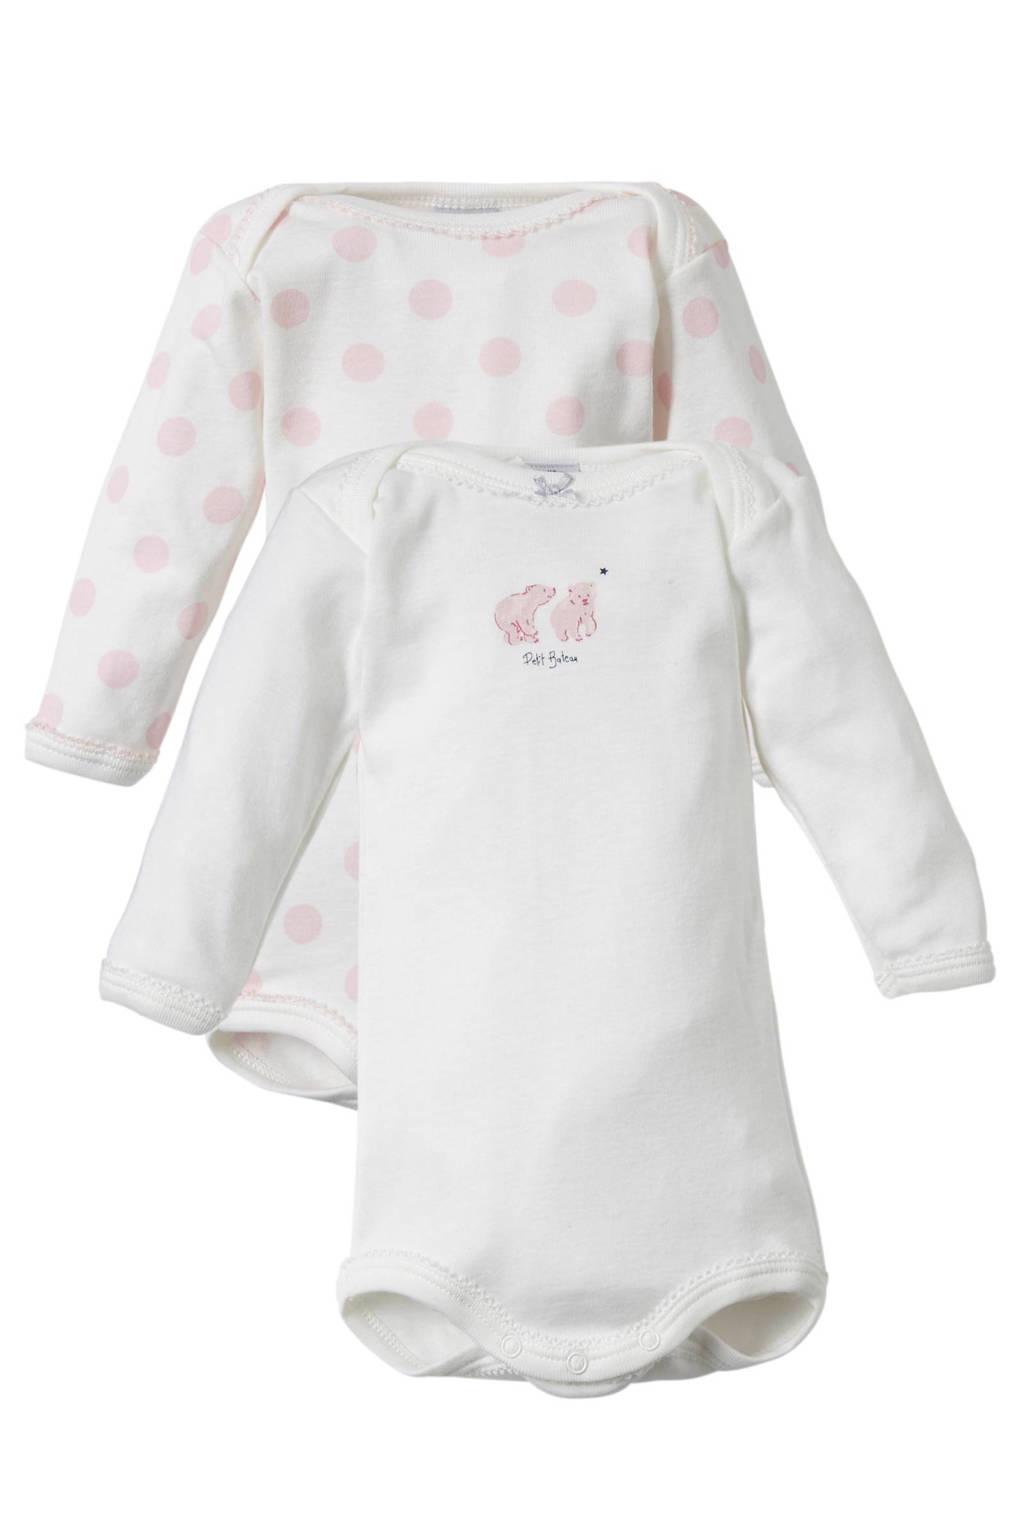 Babykamer Bateau Wit.Petit Bateau Baby Romper Set Van 2 Wehkamp